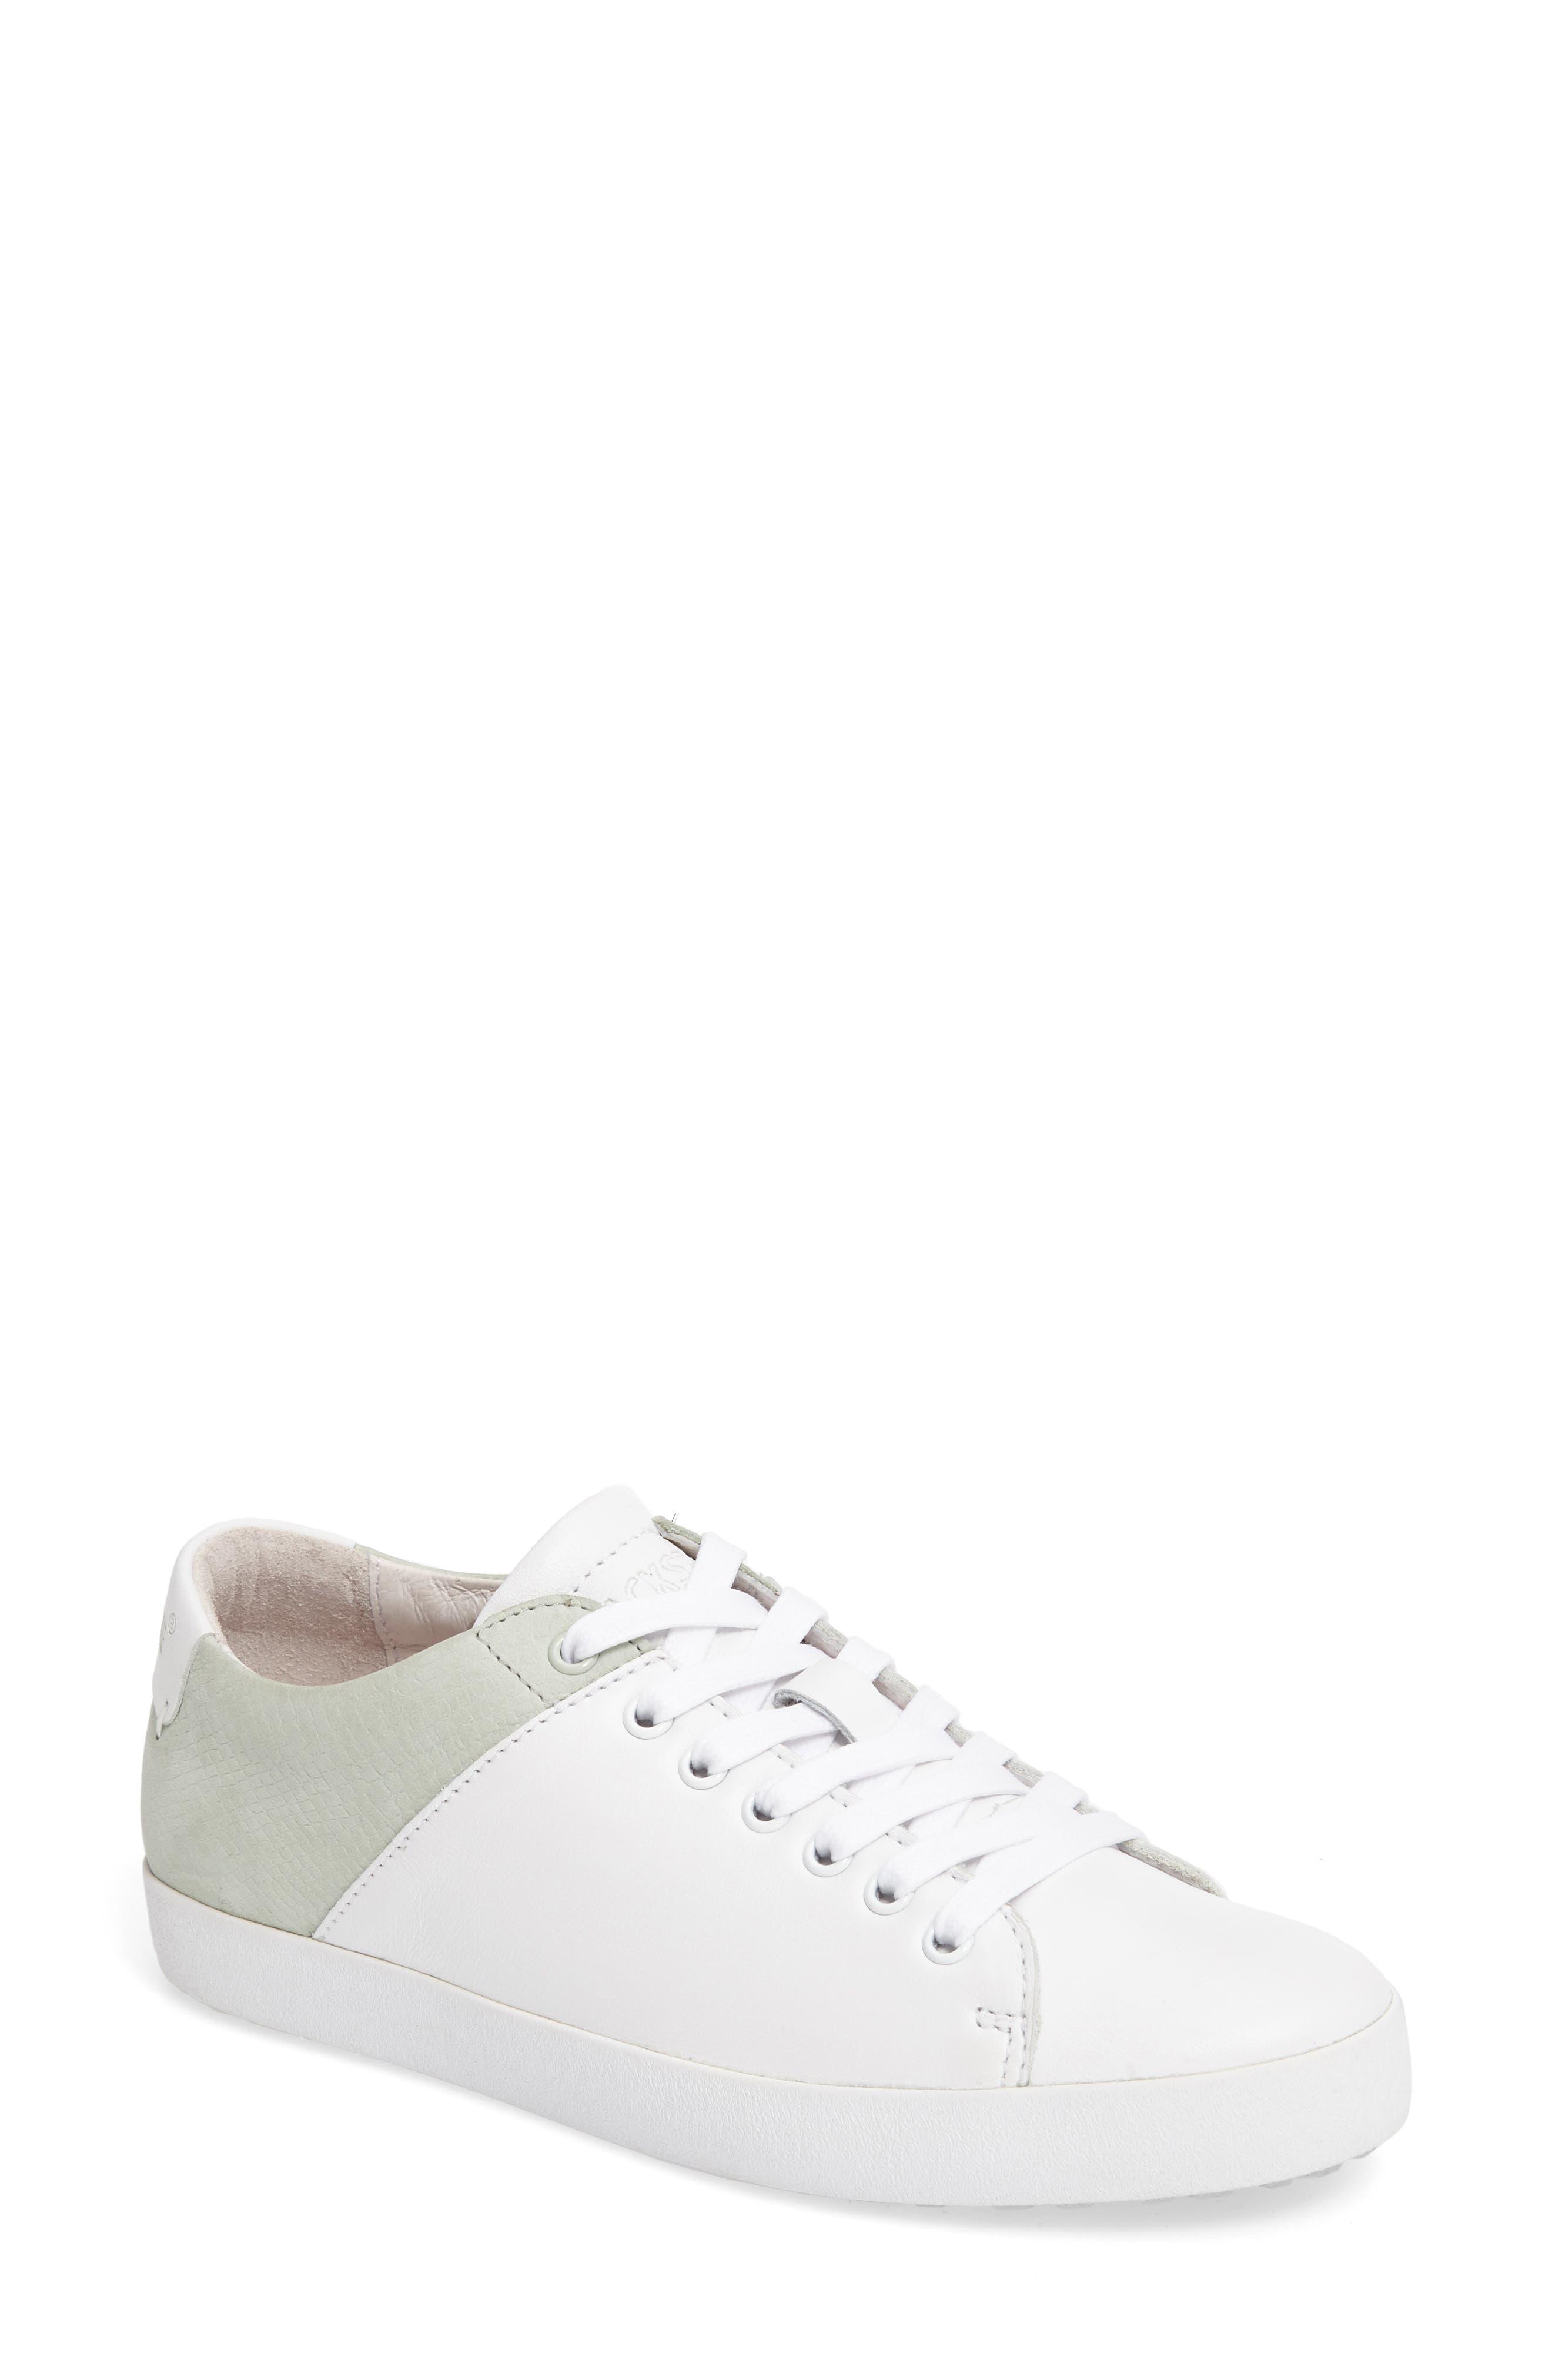 NL22 Sneaker,                             Main thumbnail 1, color,                             100